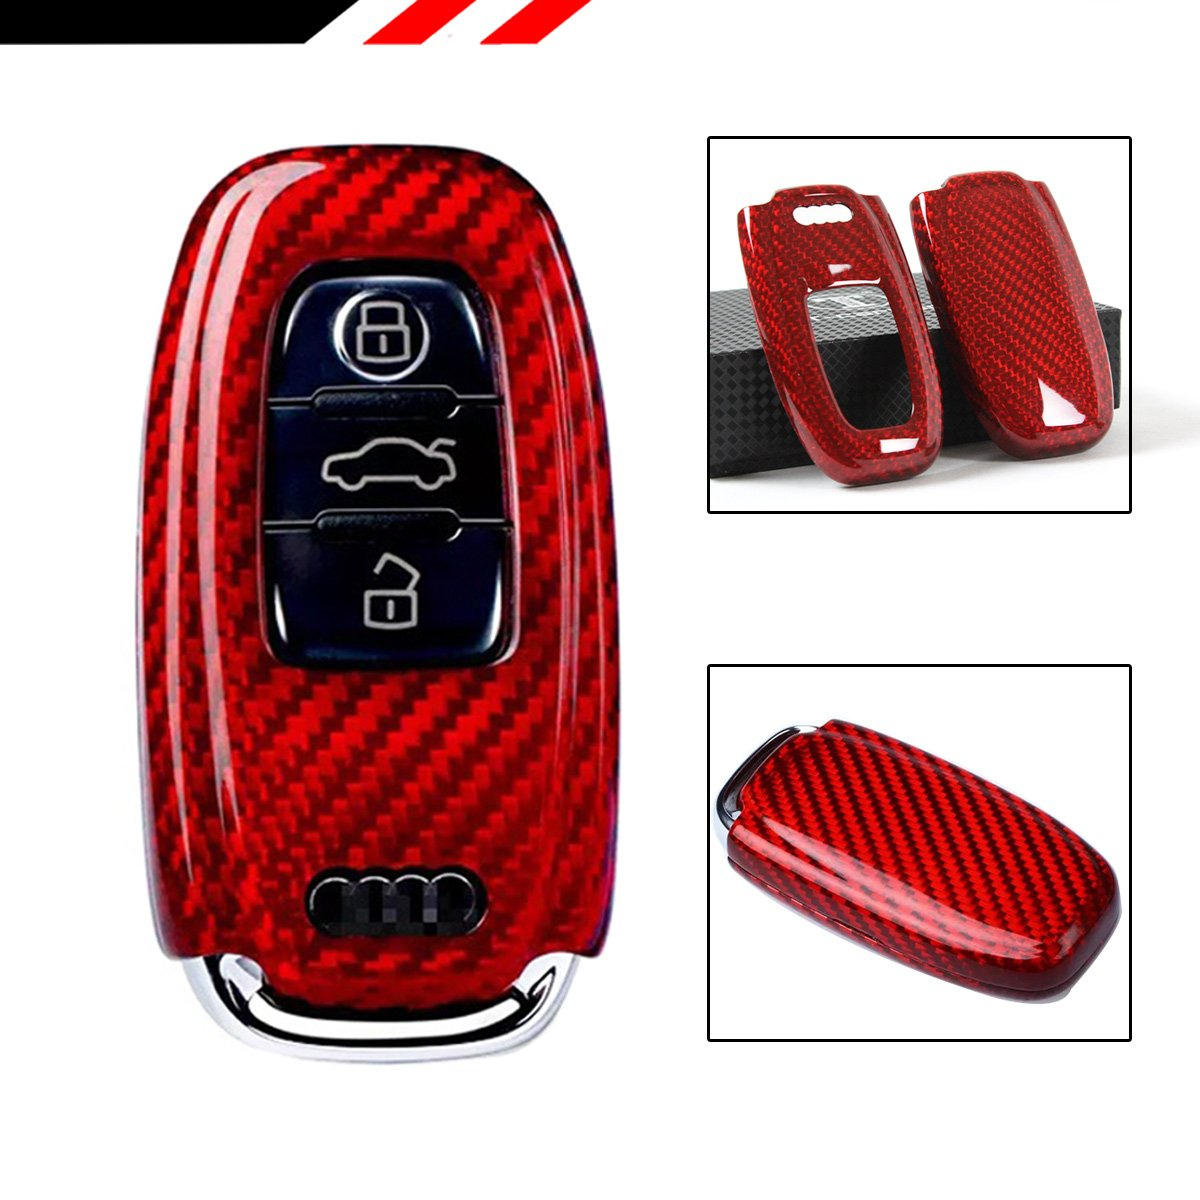 Luxury赤カーボンファイバーSnap On Case For Audi a3 a4 a5 a6 a7 s5 s7 RS TTキーFob B079C7KNVW